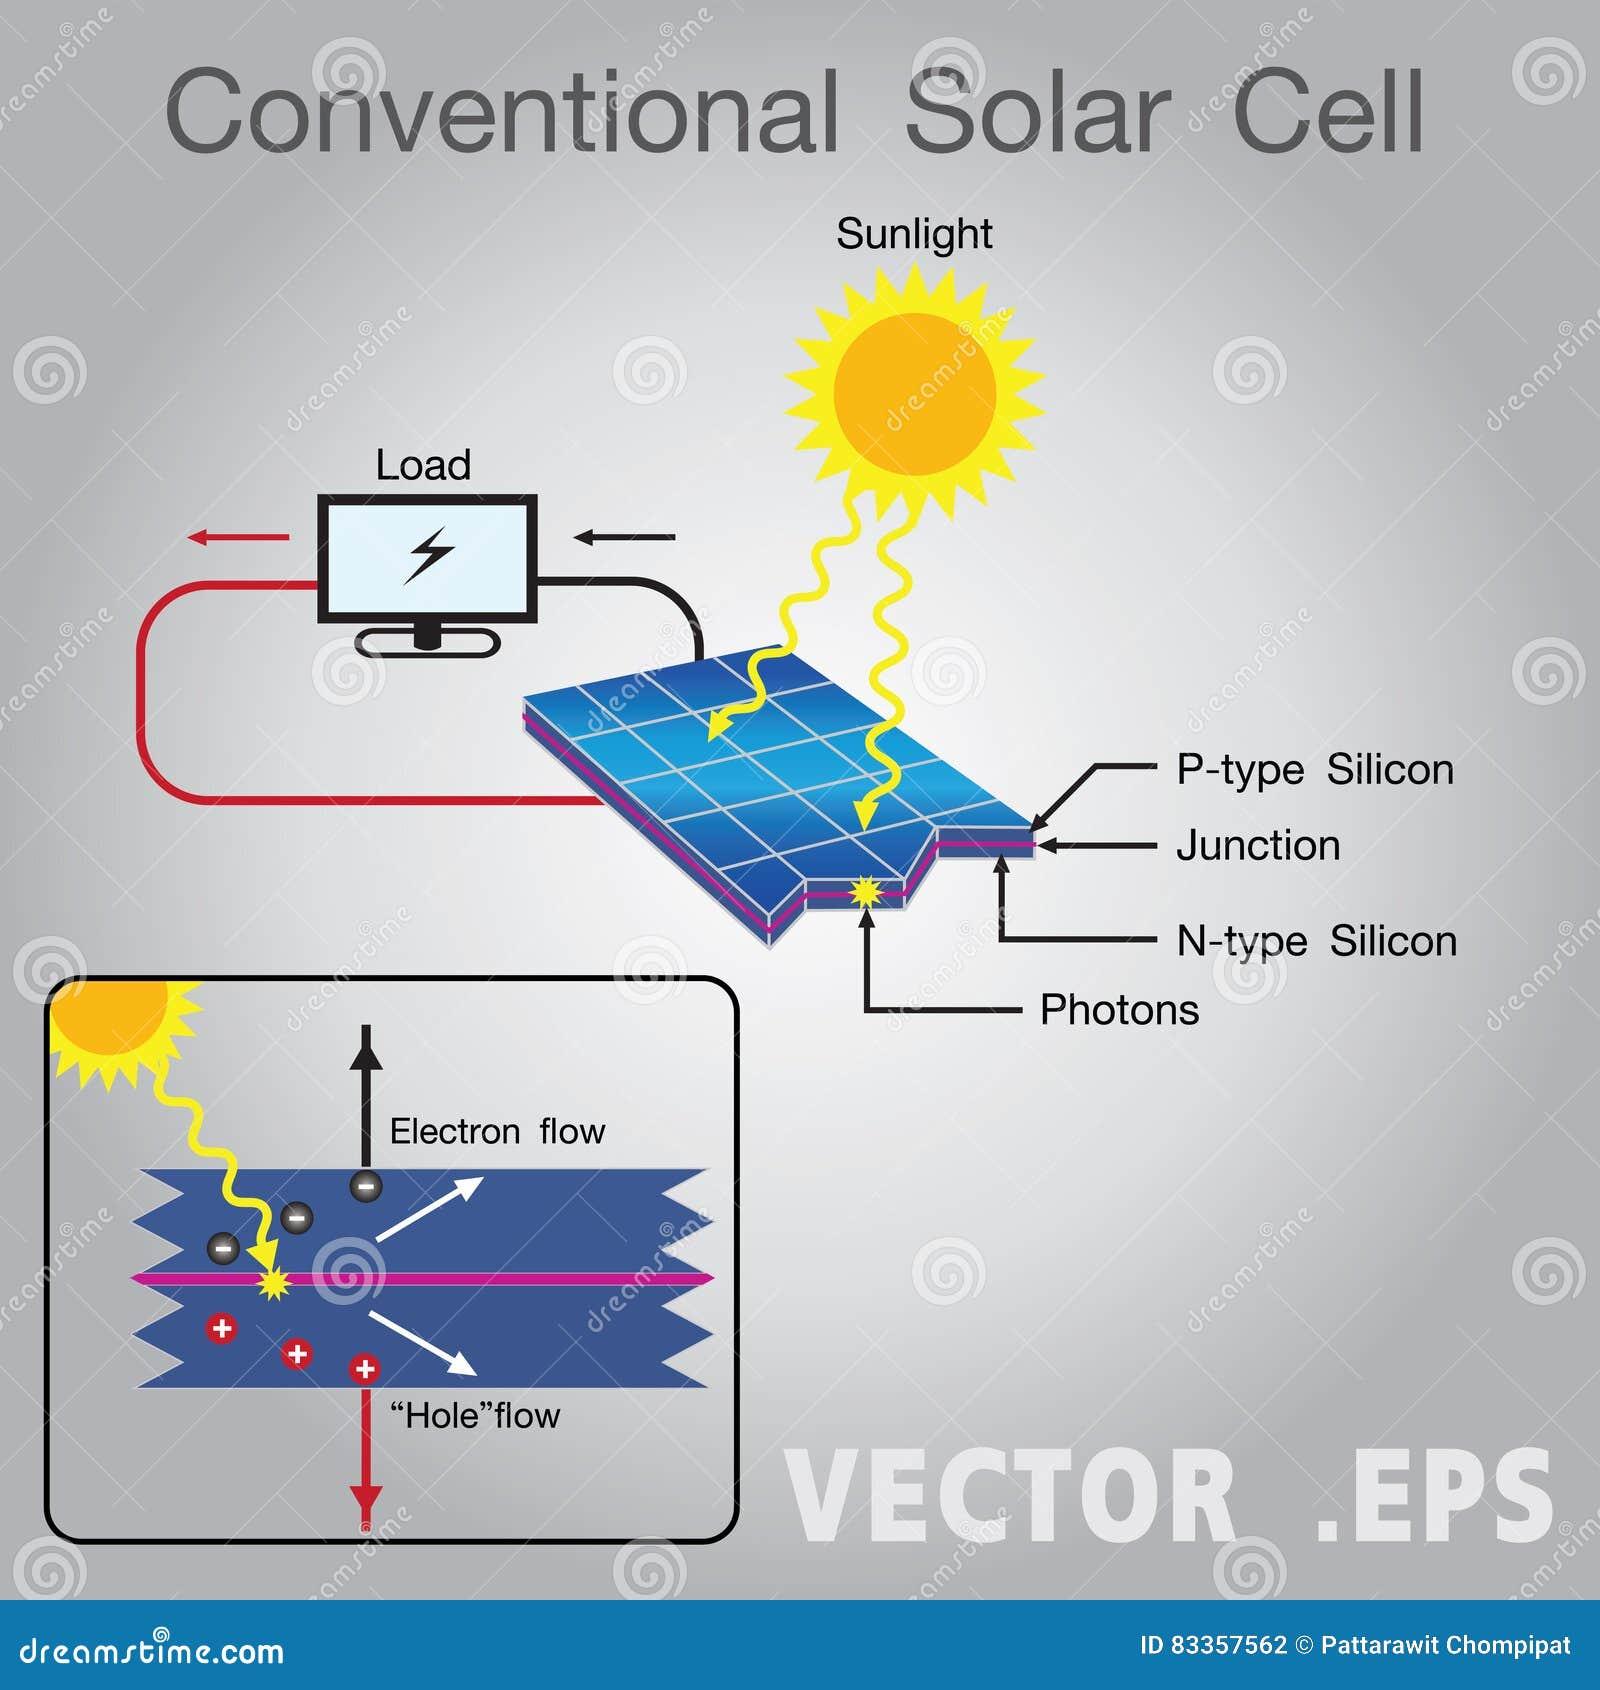 solar cell diagram education infographic vector design stock